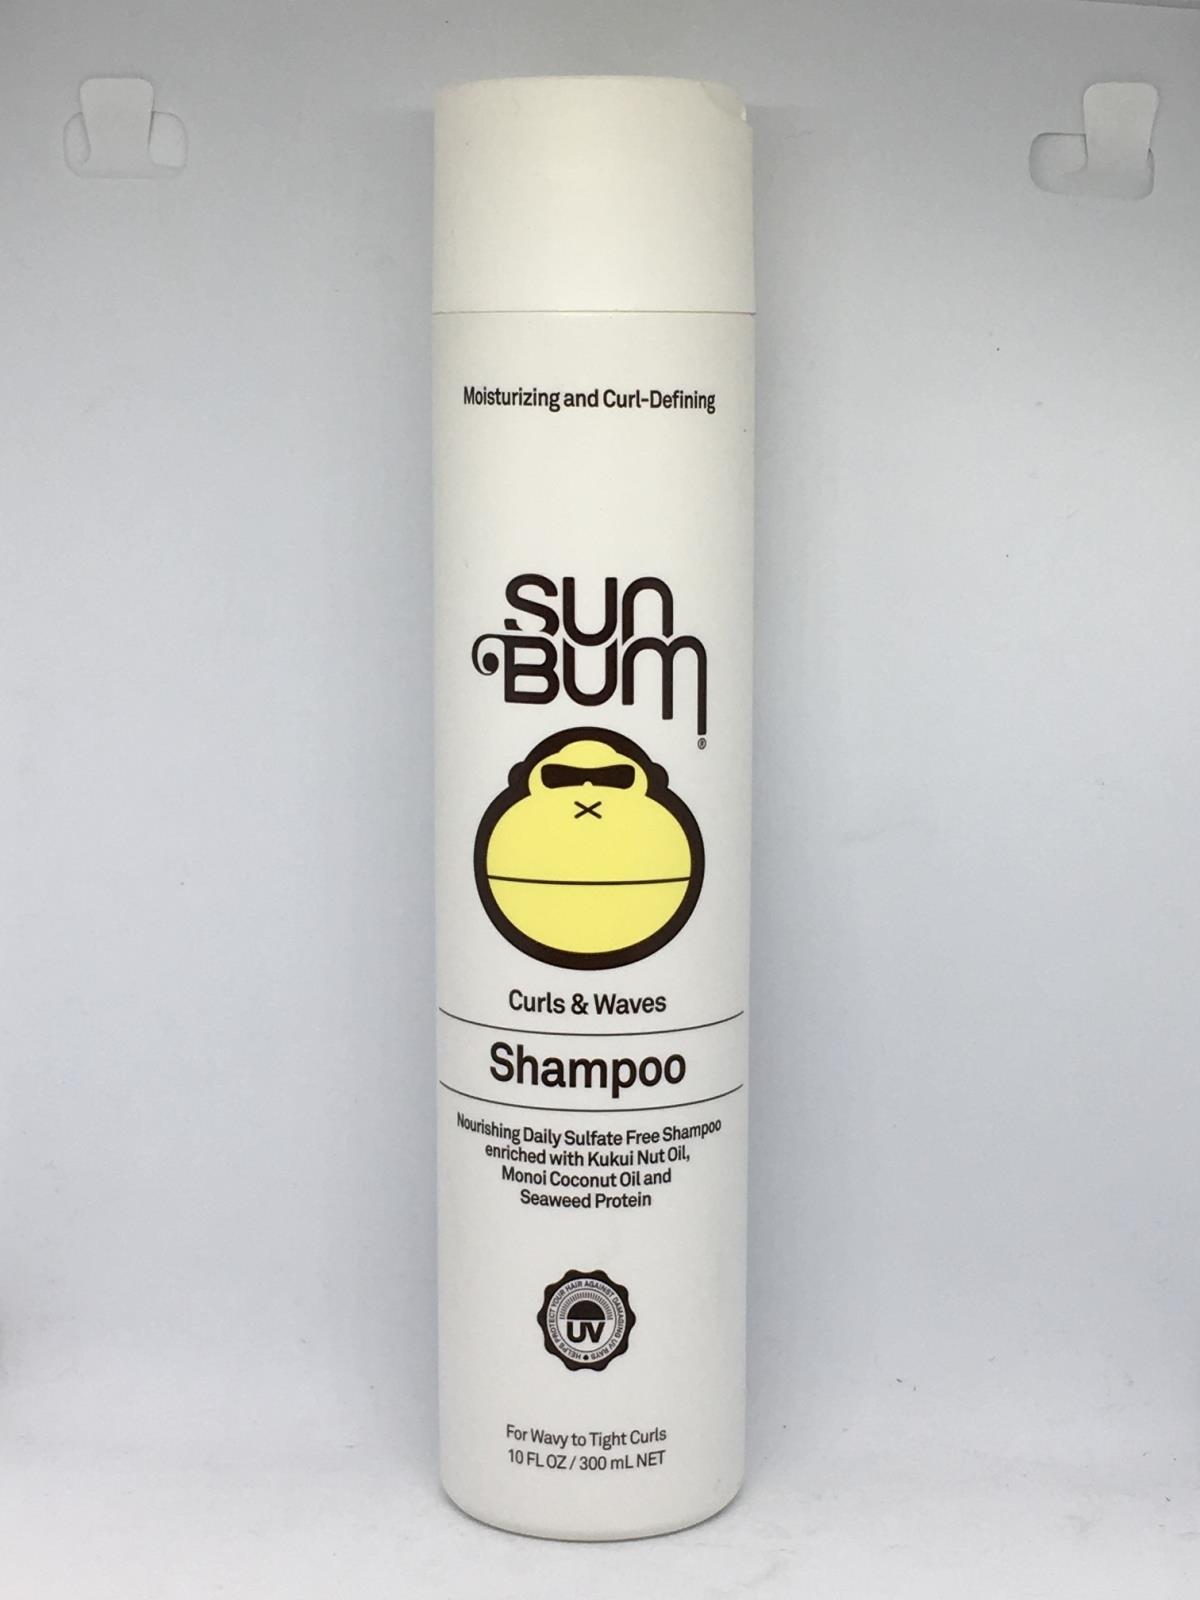 Details about Sun Bum Moisturizing and Curl-Defining Curls & Waves Shampoo  10 FlOz